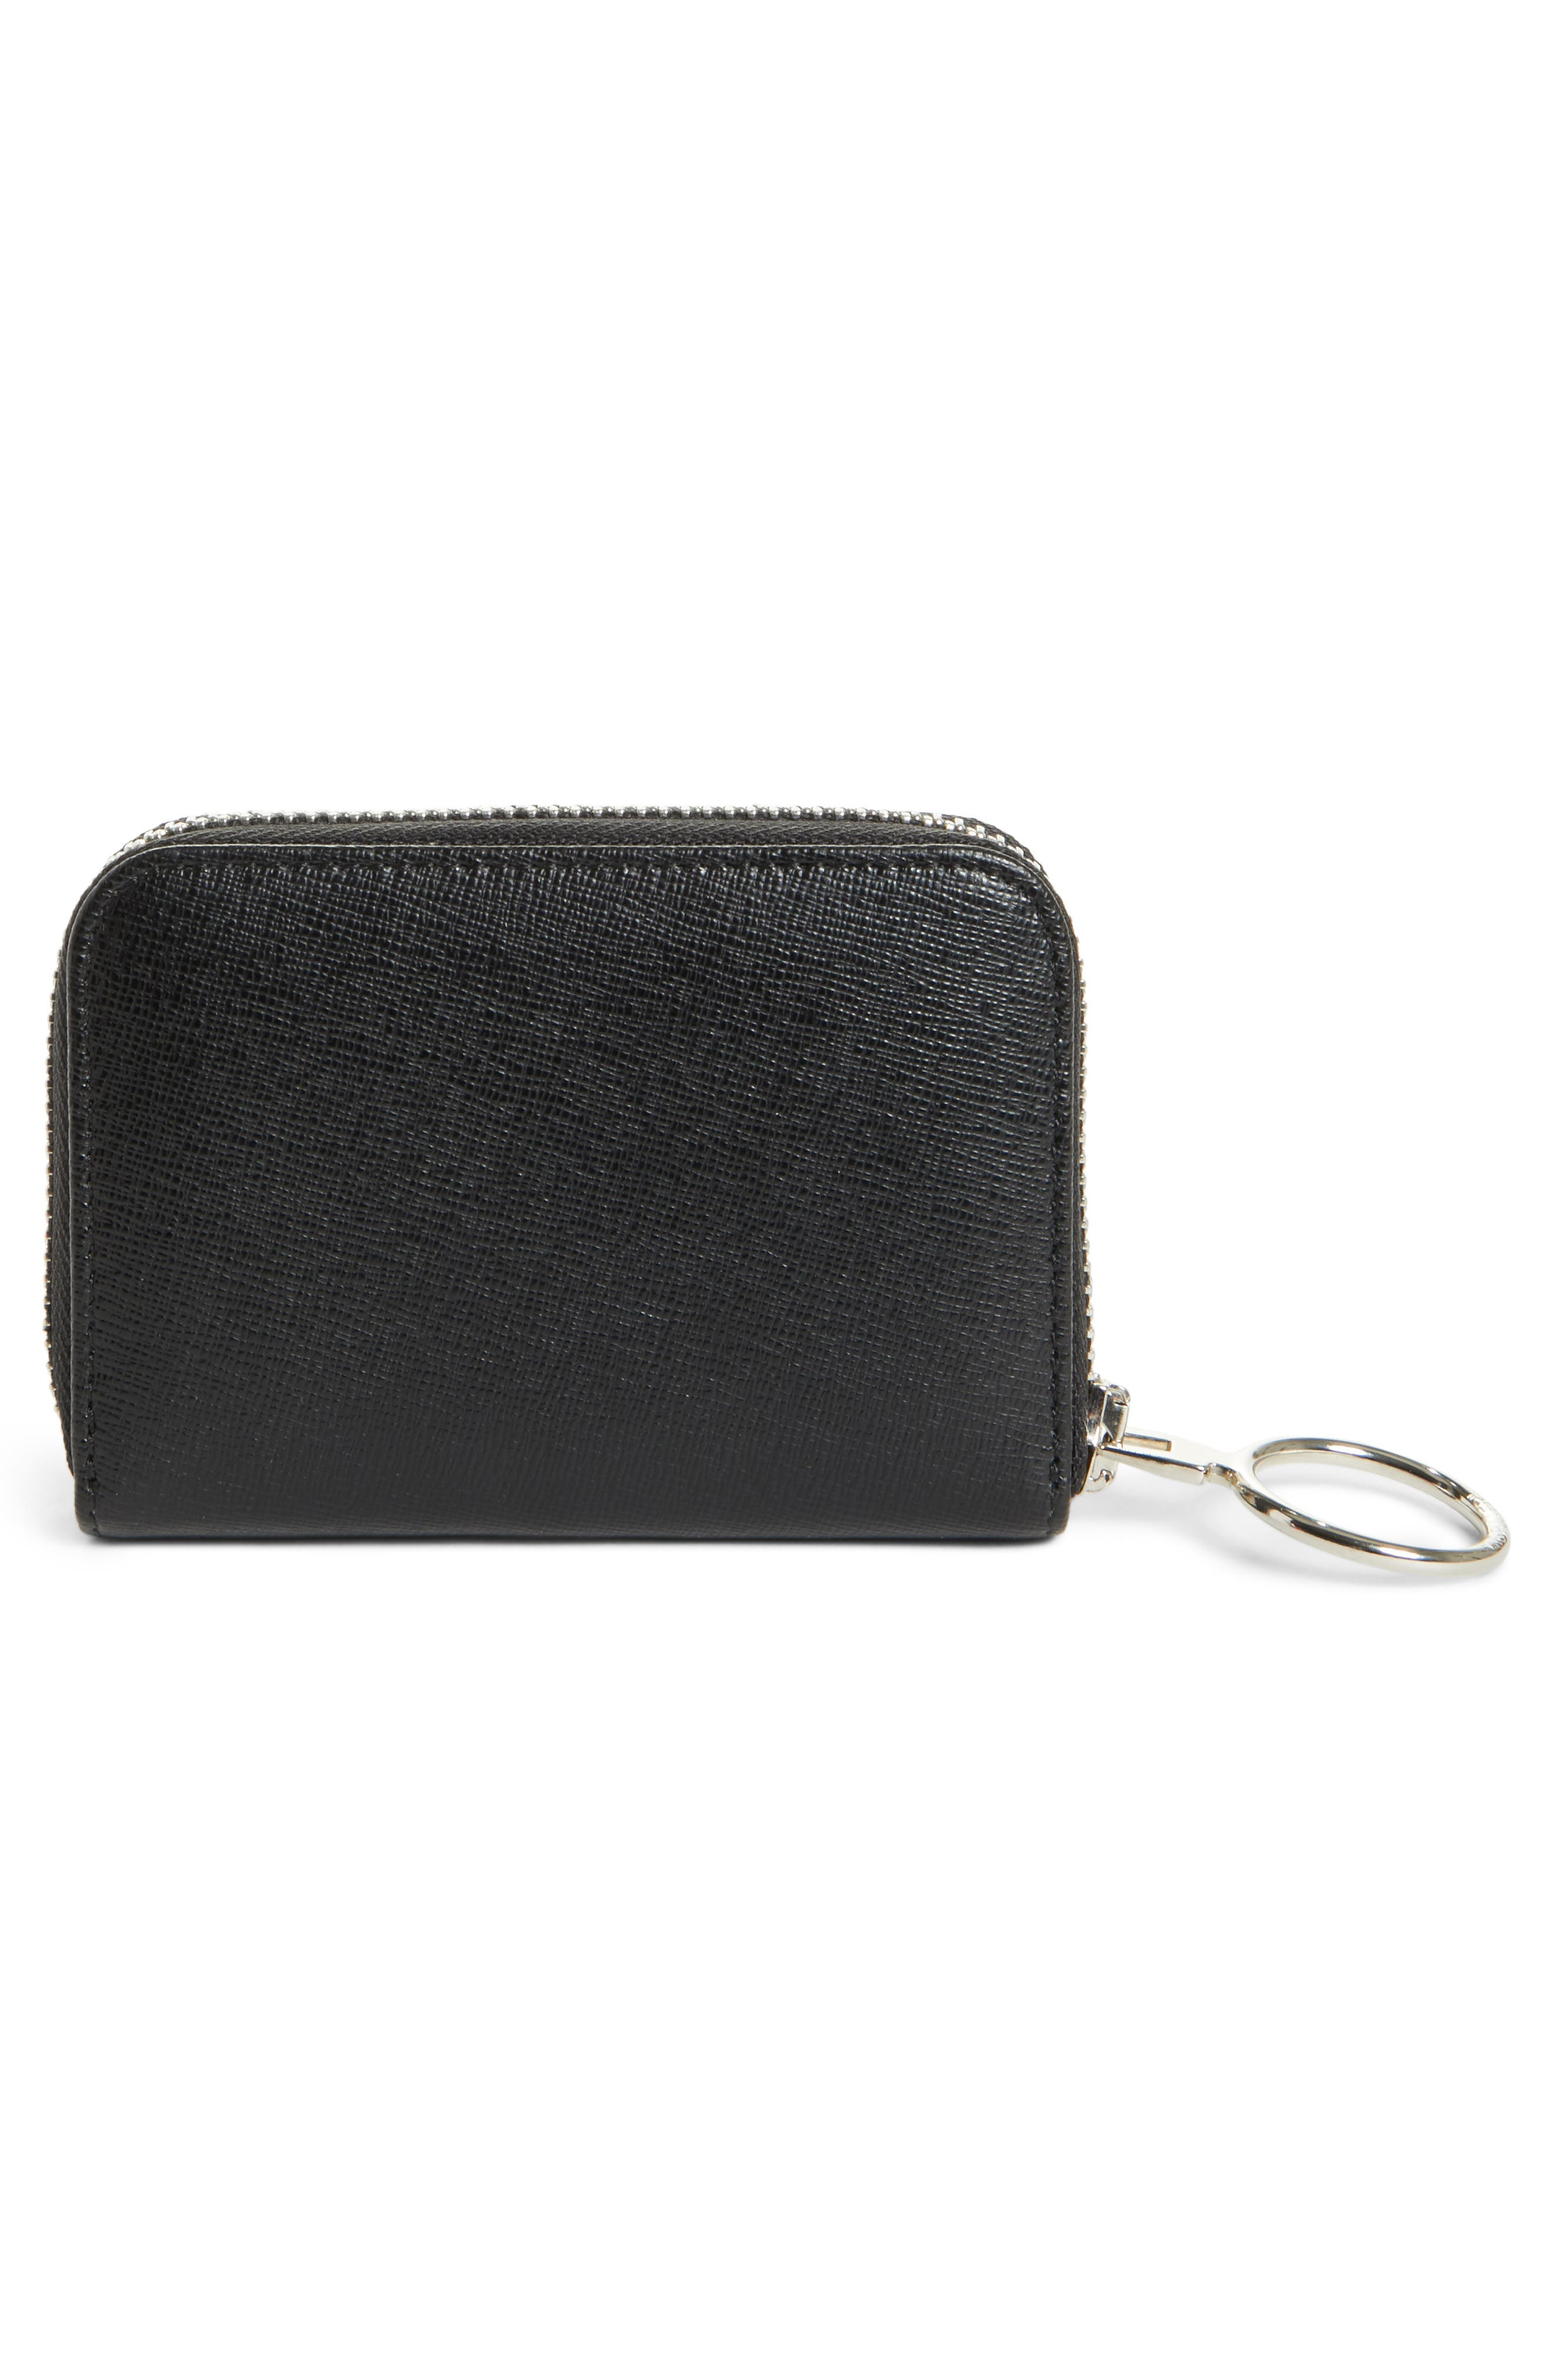 Medium Zip Wallet,                             Alternate thumbnail 3, color,                             001